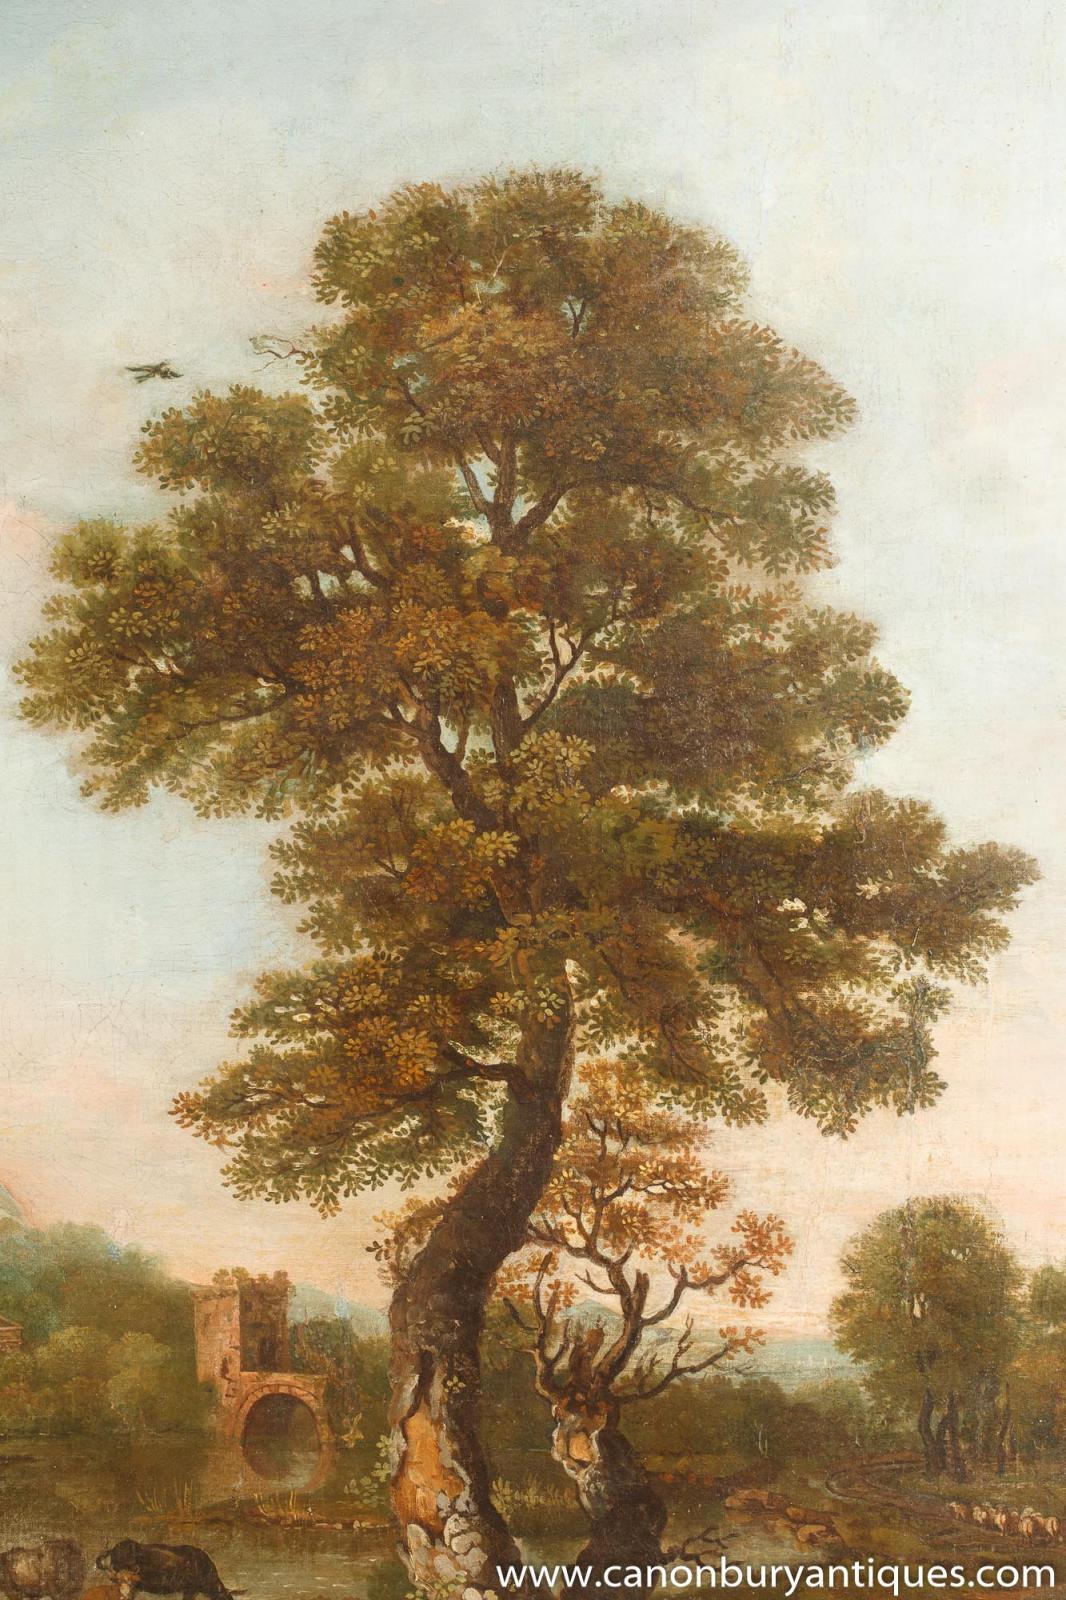 Antique Italian Tuscan Landscape Oil Painting 18th Century